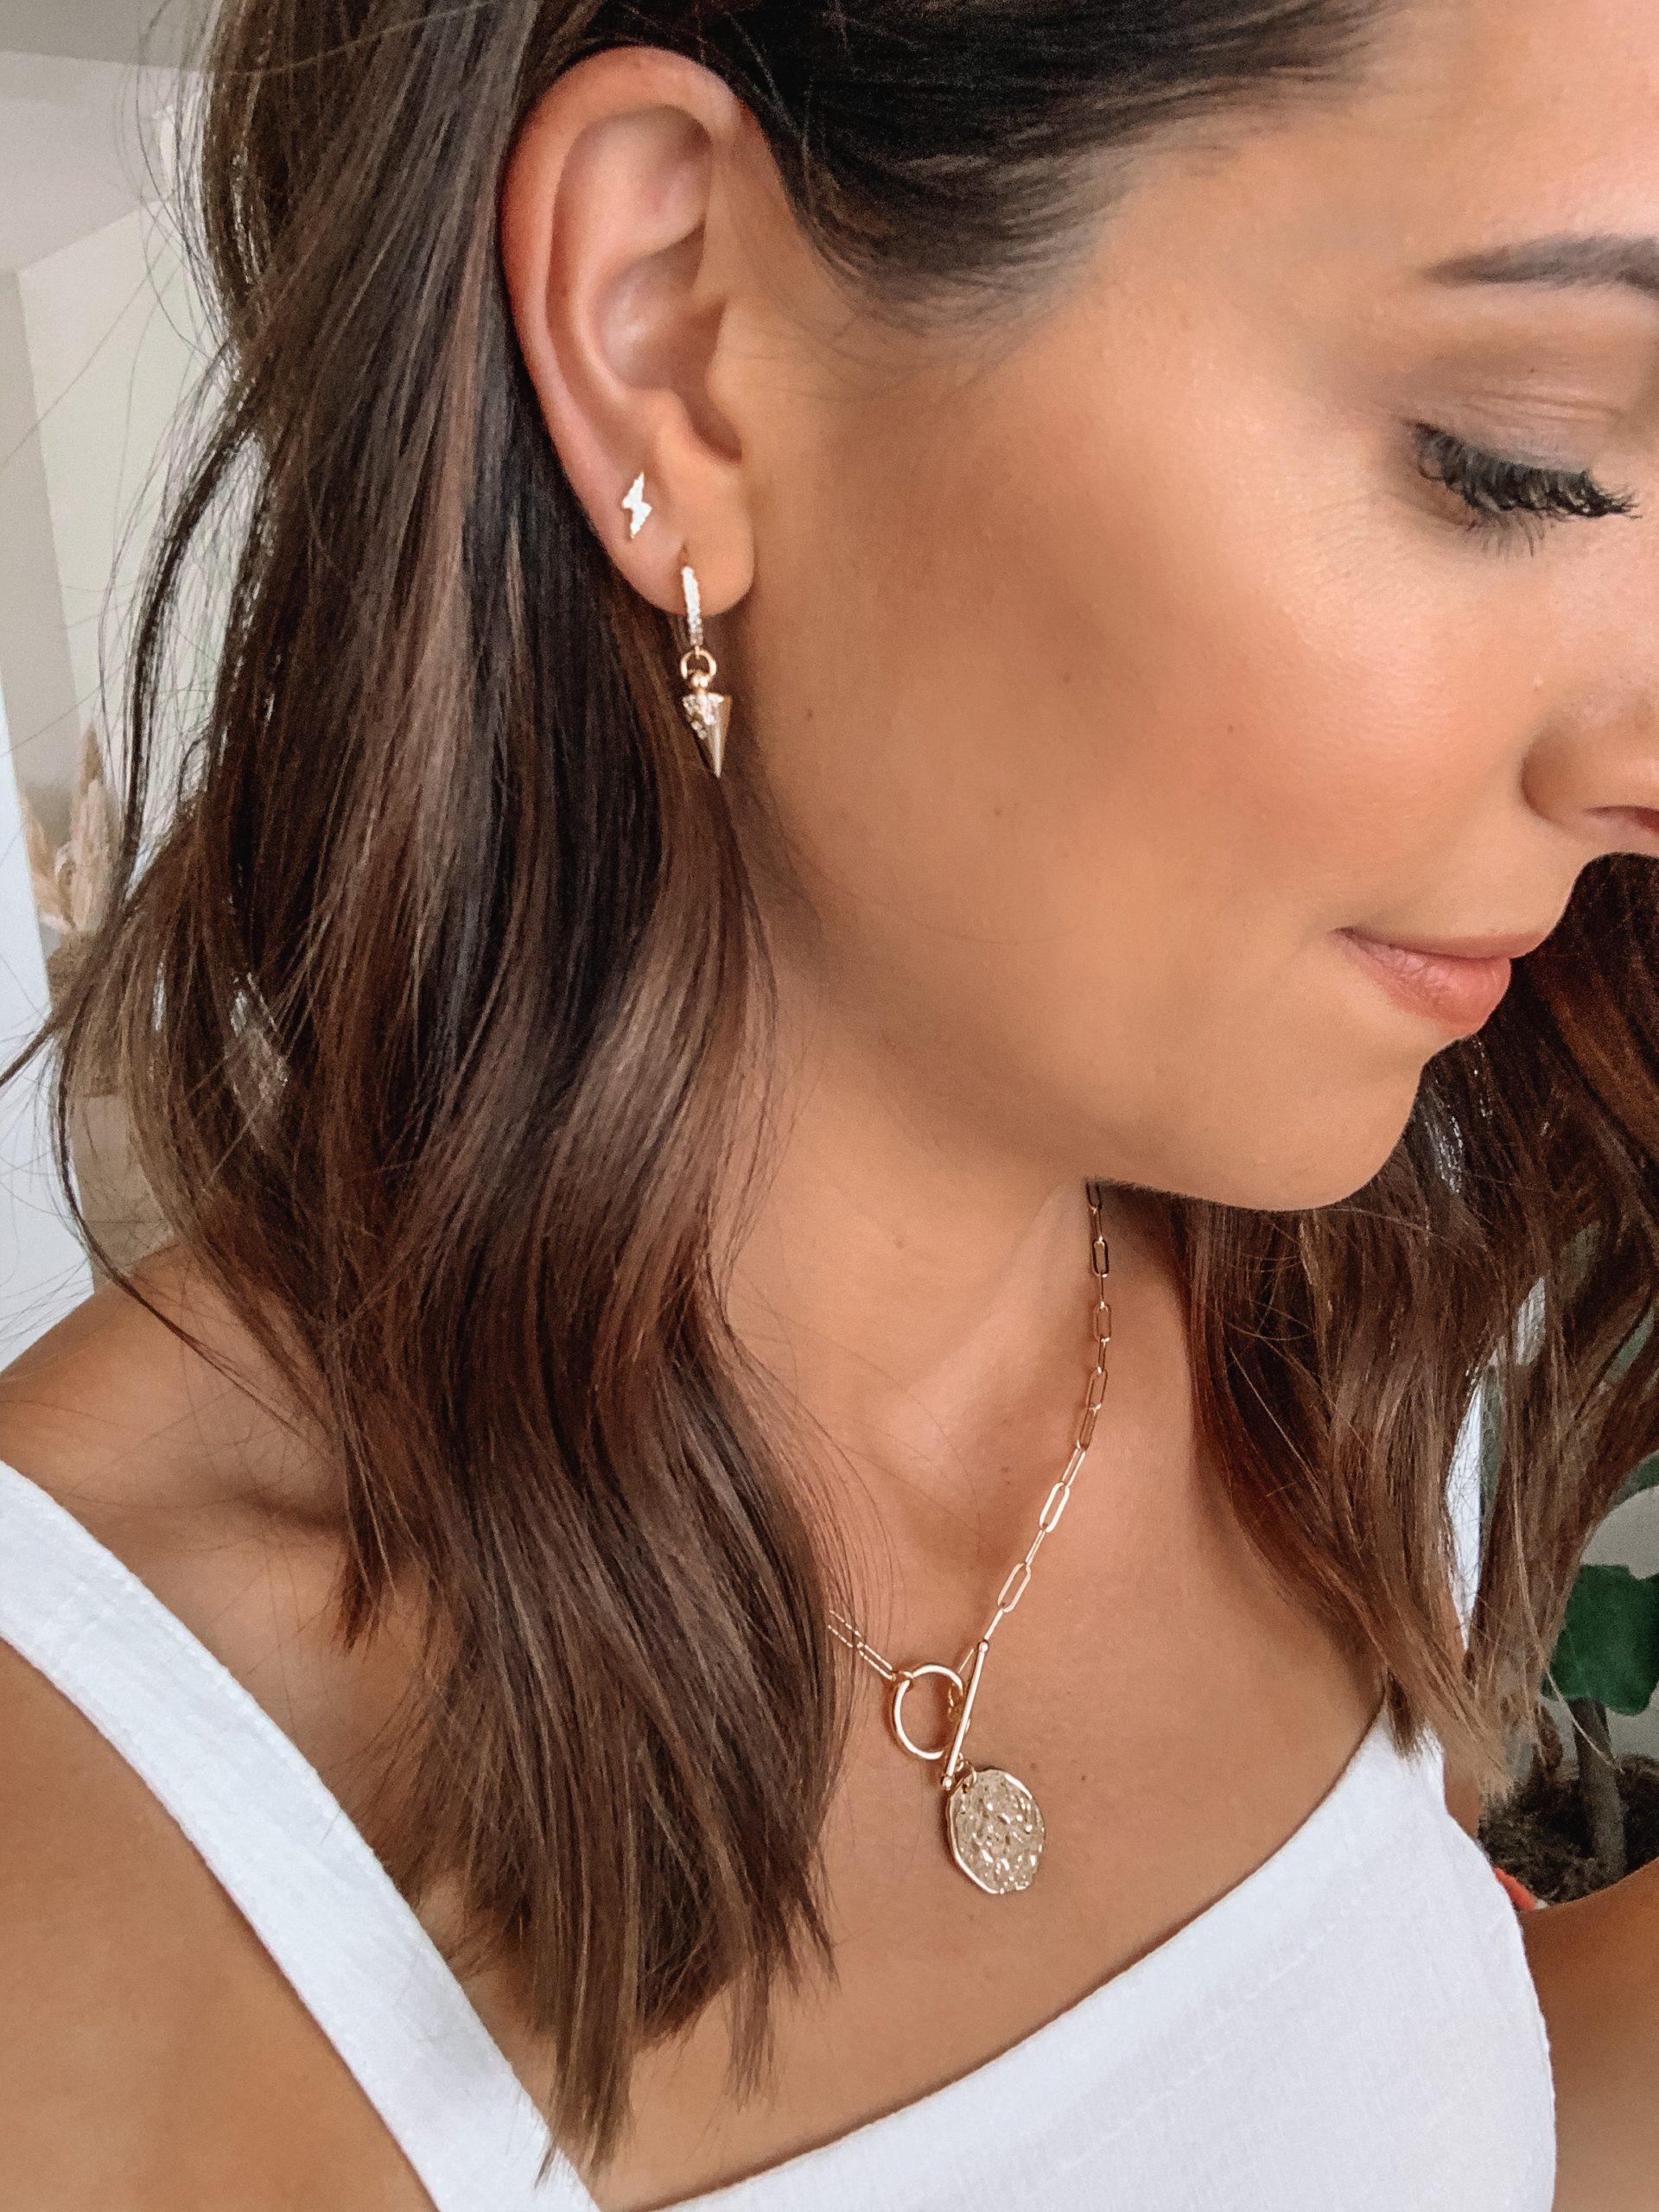 amazon finds, amazon fashion, huggie earrings, gold hoops, bolt studs